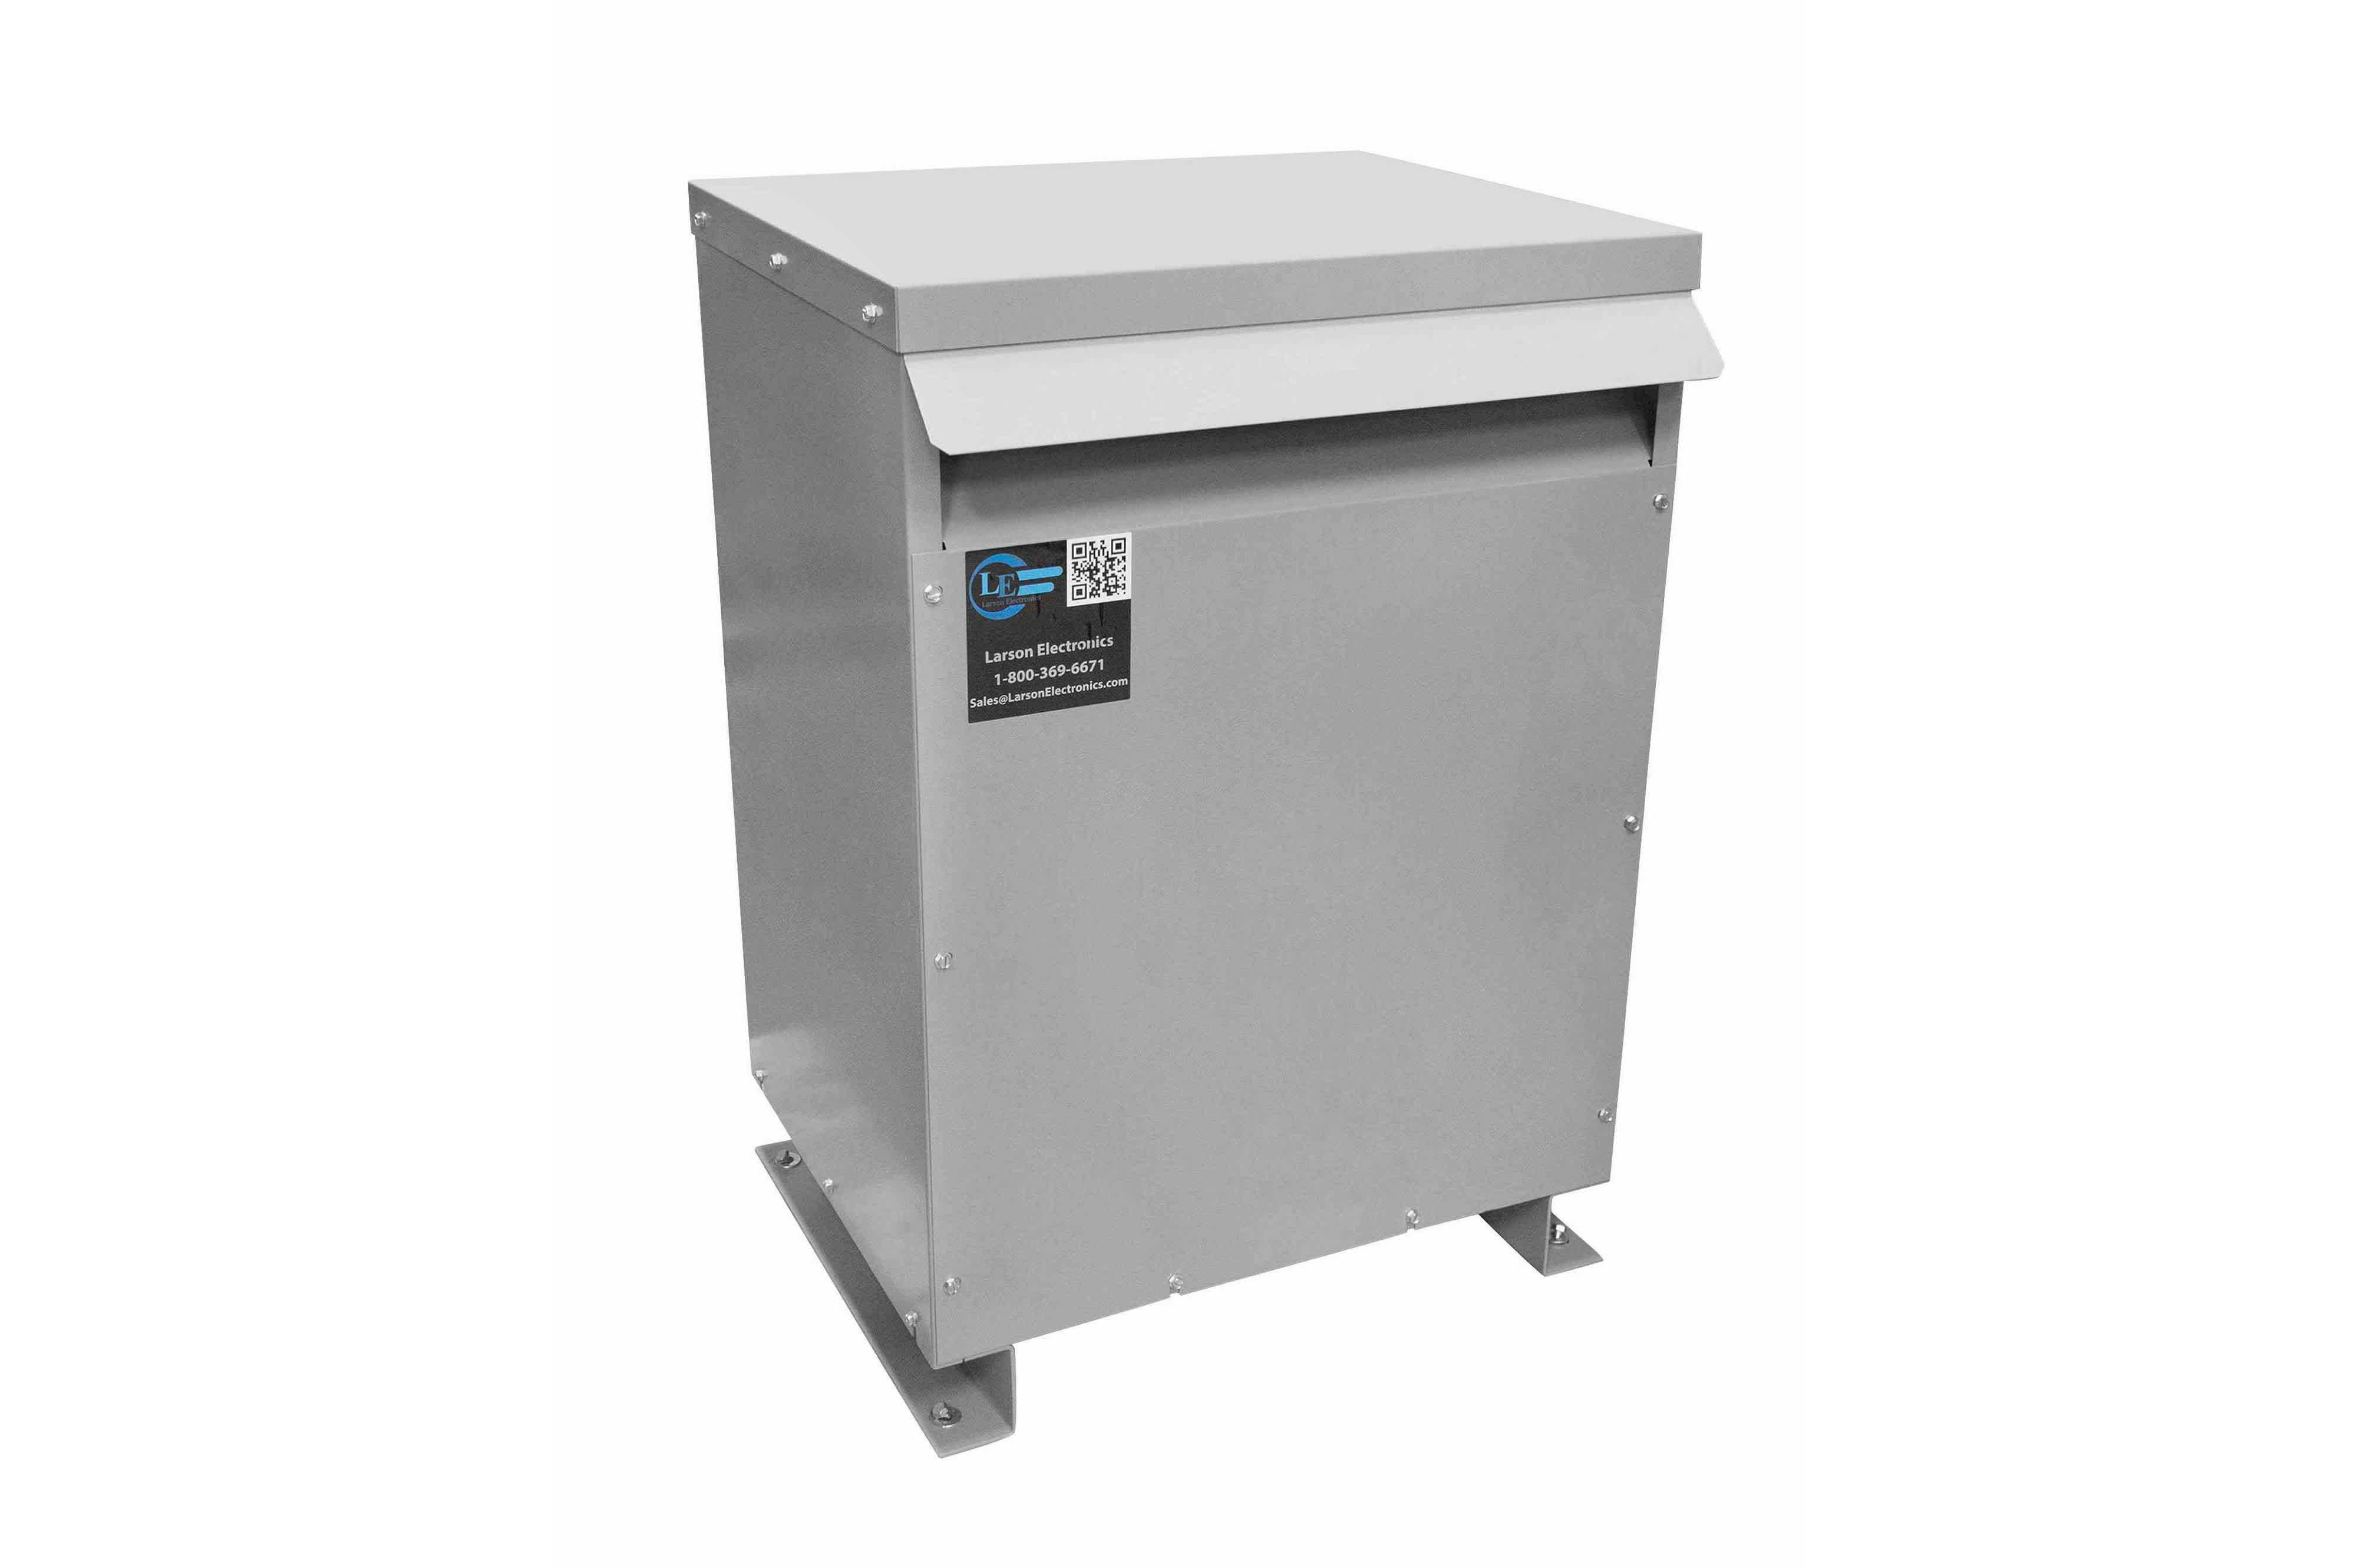 600 kVA 3PH Isolation Transformer, 415V Wye Primary, 240V Delta Secondary, N3R, Ventilated, 60 Hz